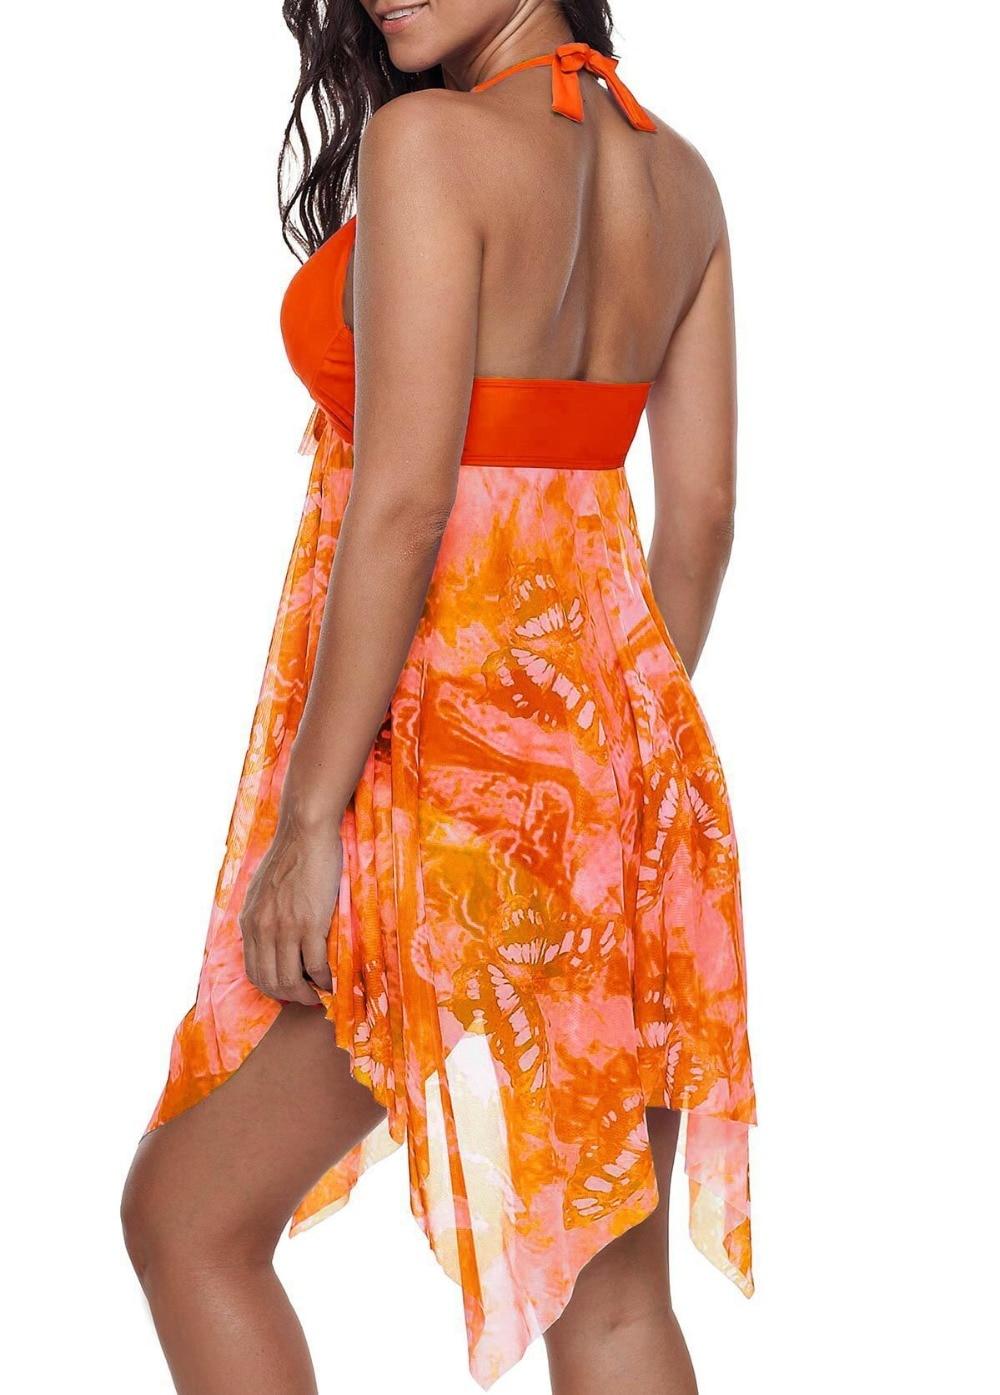 Mesh Women Tankini Swimdress Plus Size Swimwear 5XL One Piece Large Size Swimsuit With Skirt Push Up Halter Bathing Suit  (4)